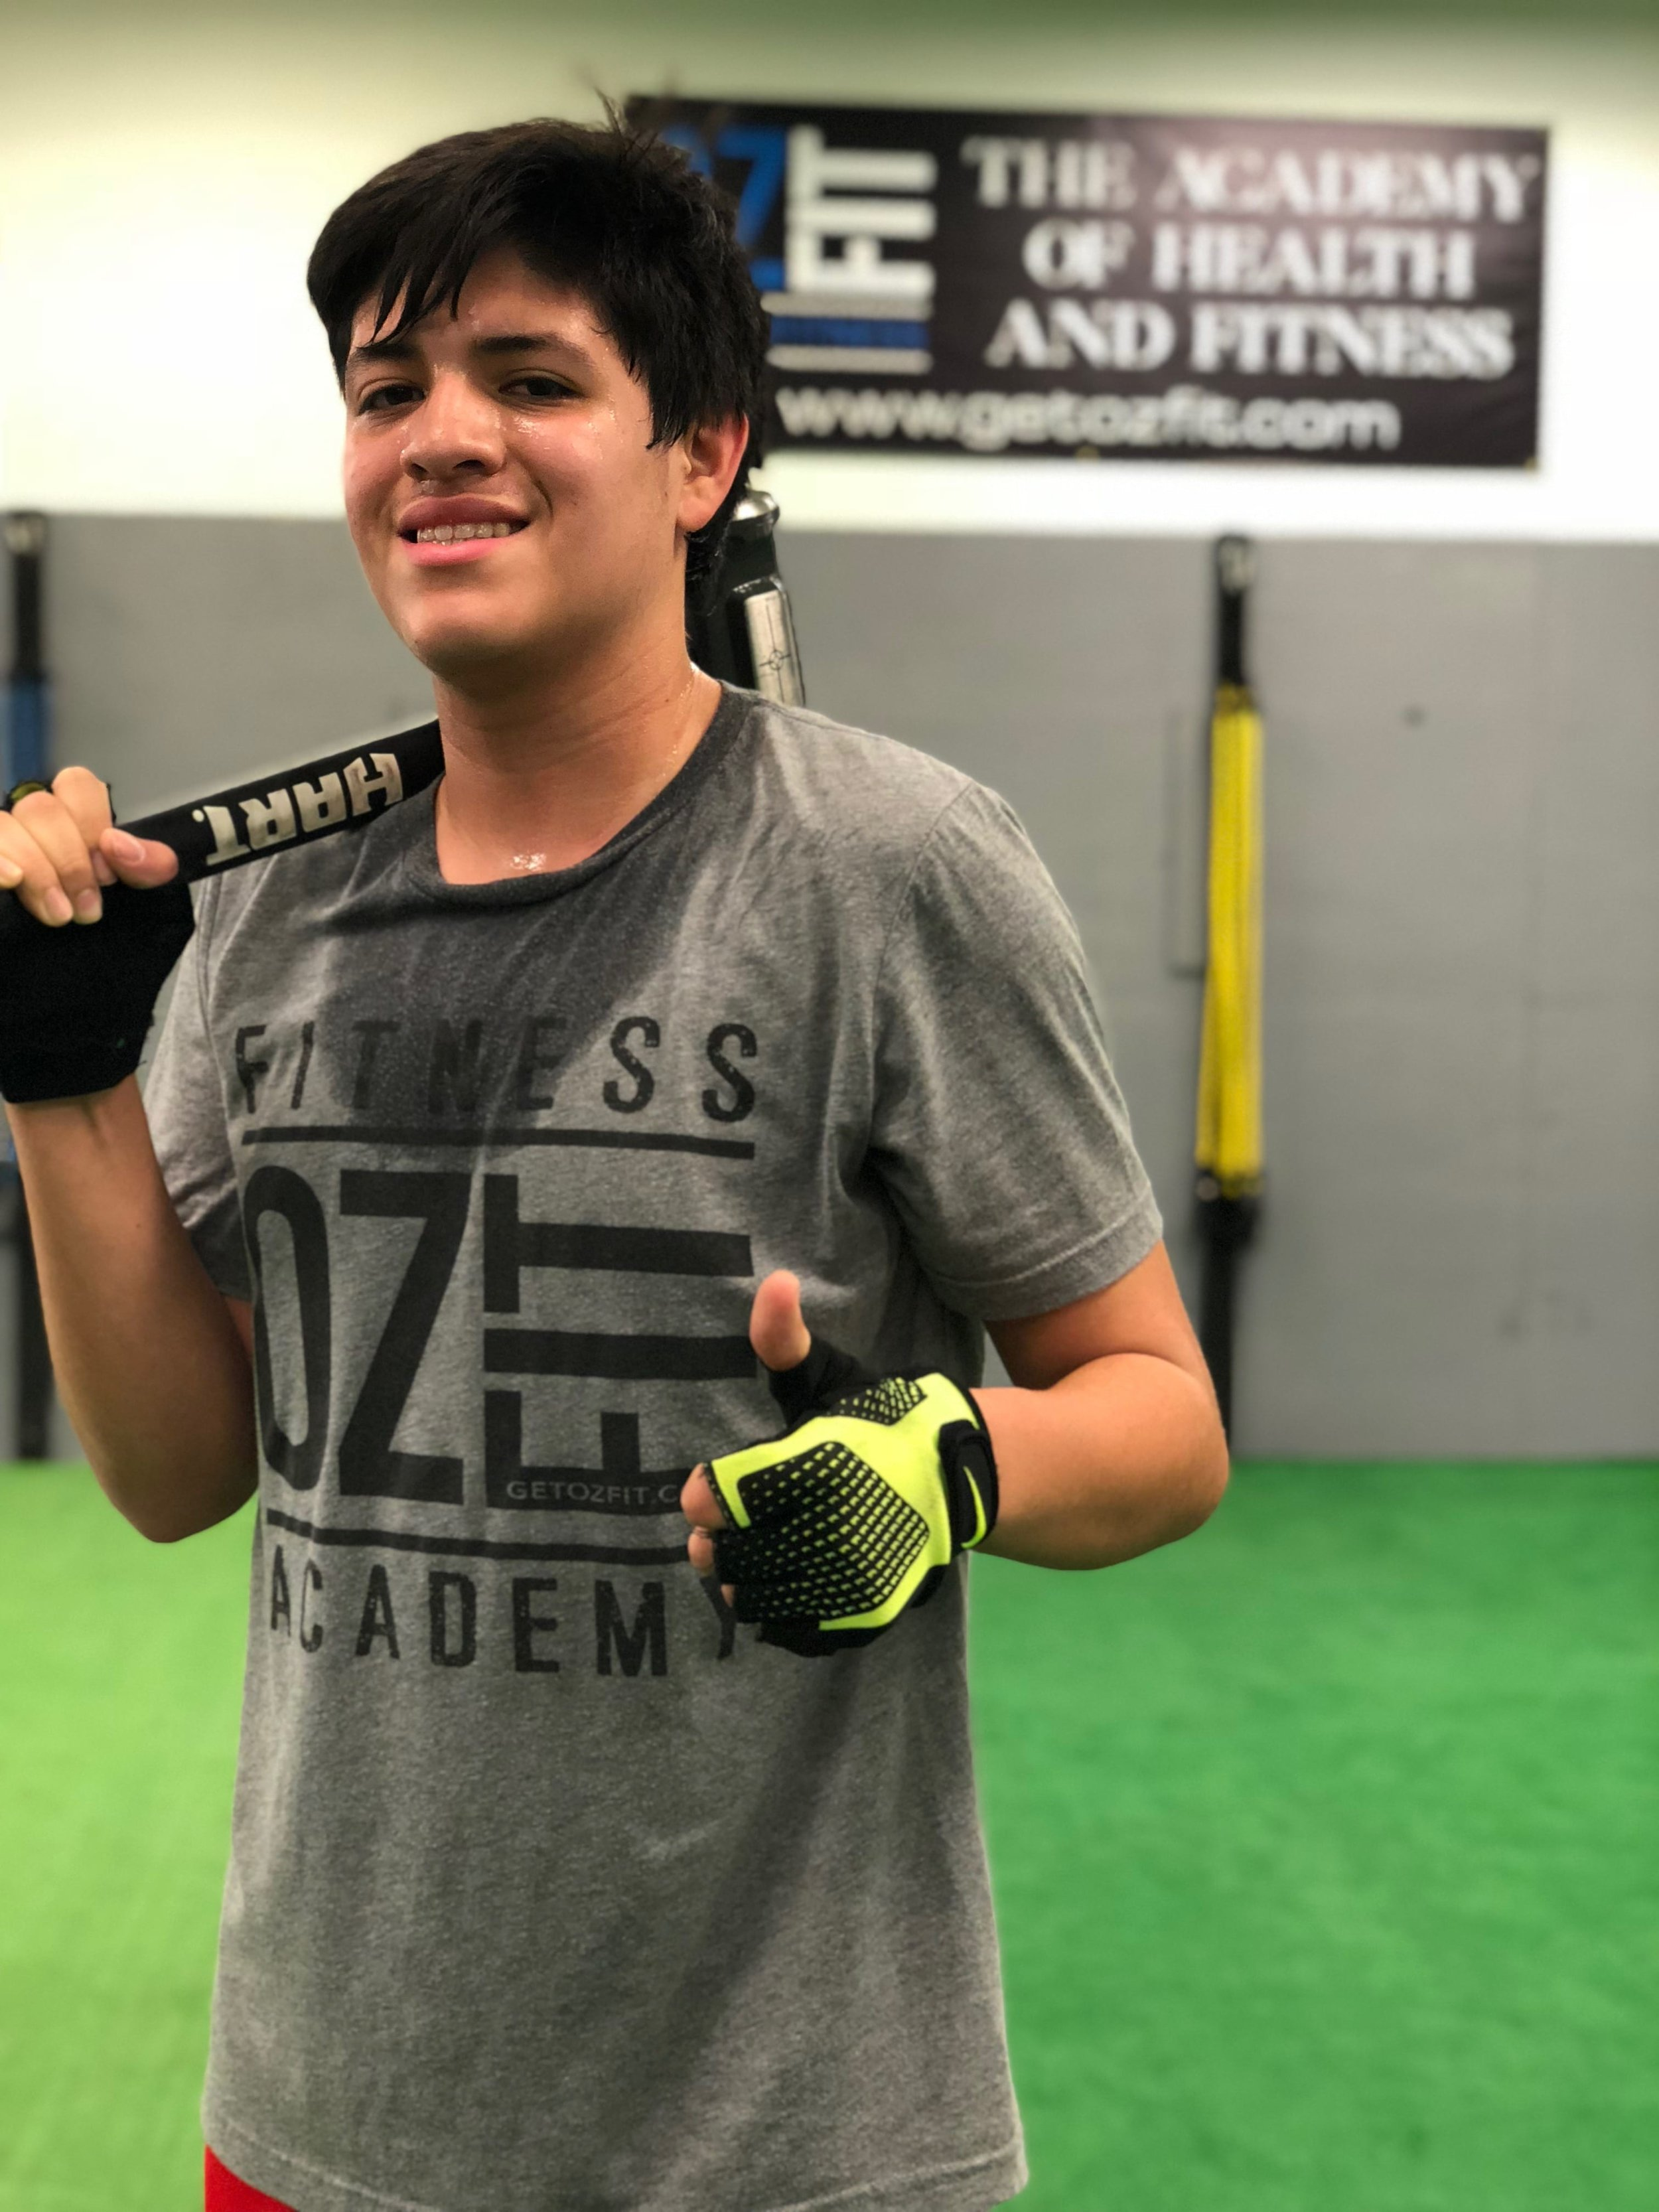 Get Oz Fit - Personal Trainer in Bergen County New Jersey - Ozzy Dugulubgov - Kids Training - Youth Fitness Program NJ (6)-min.jpeg